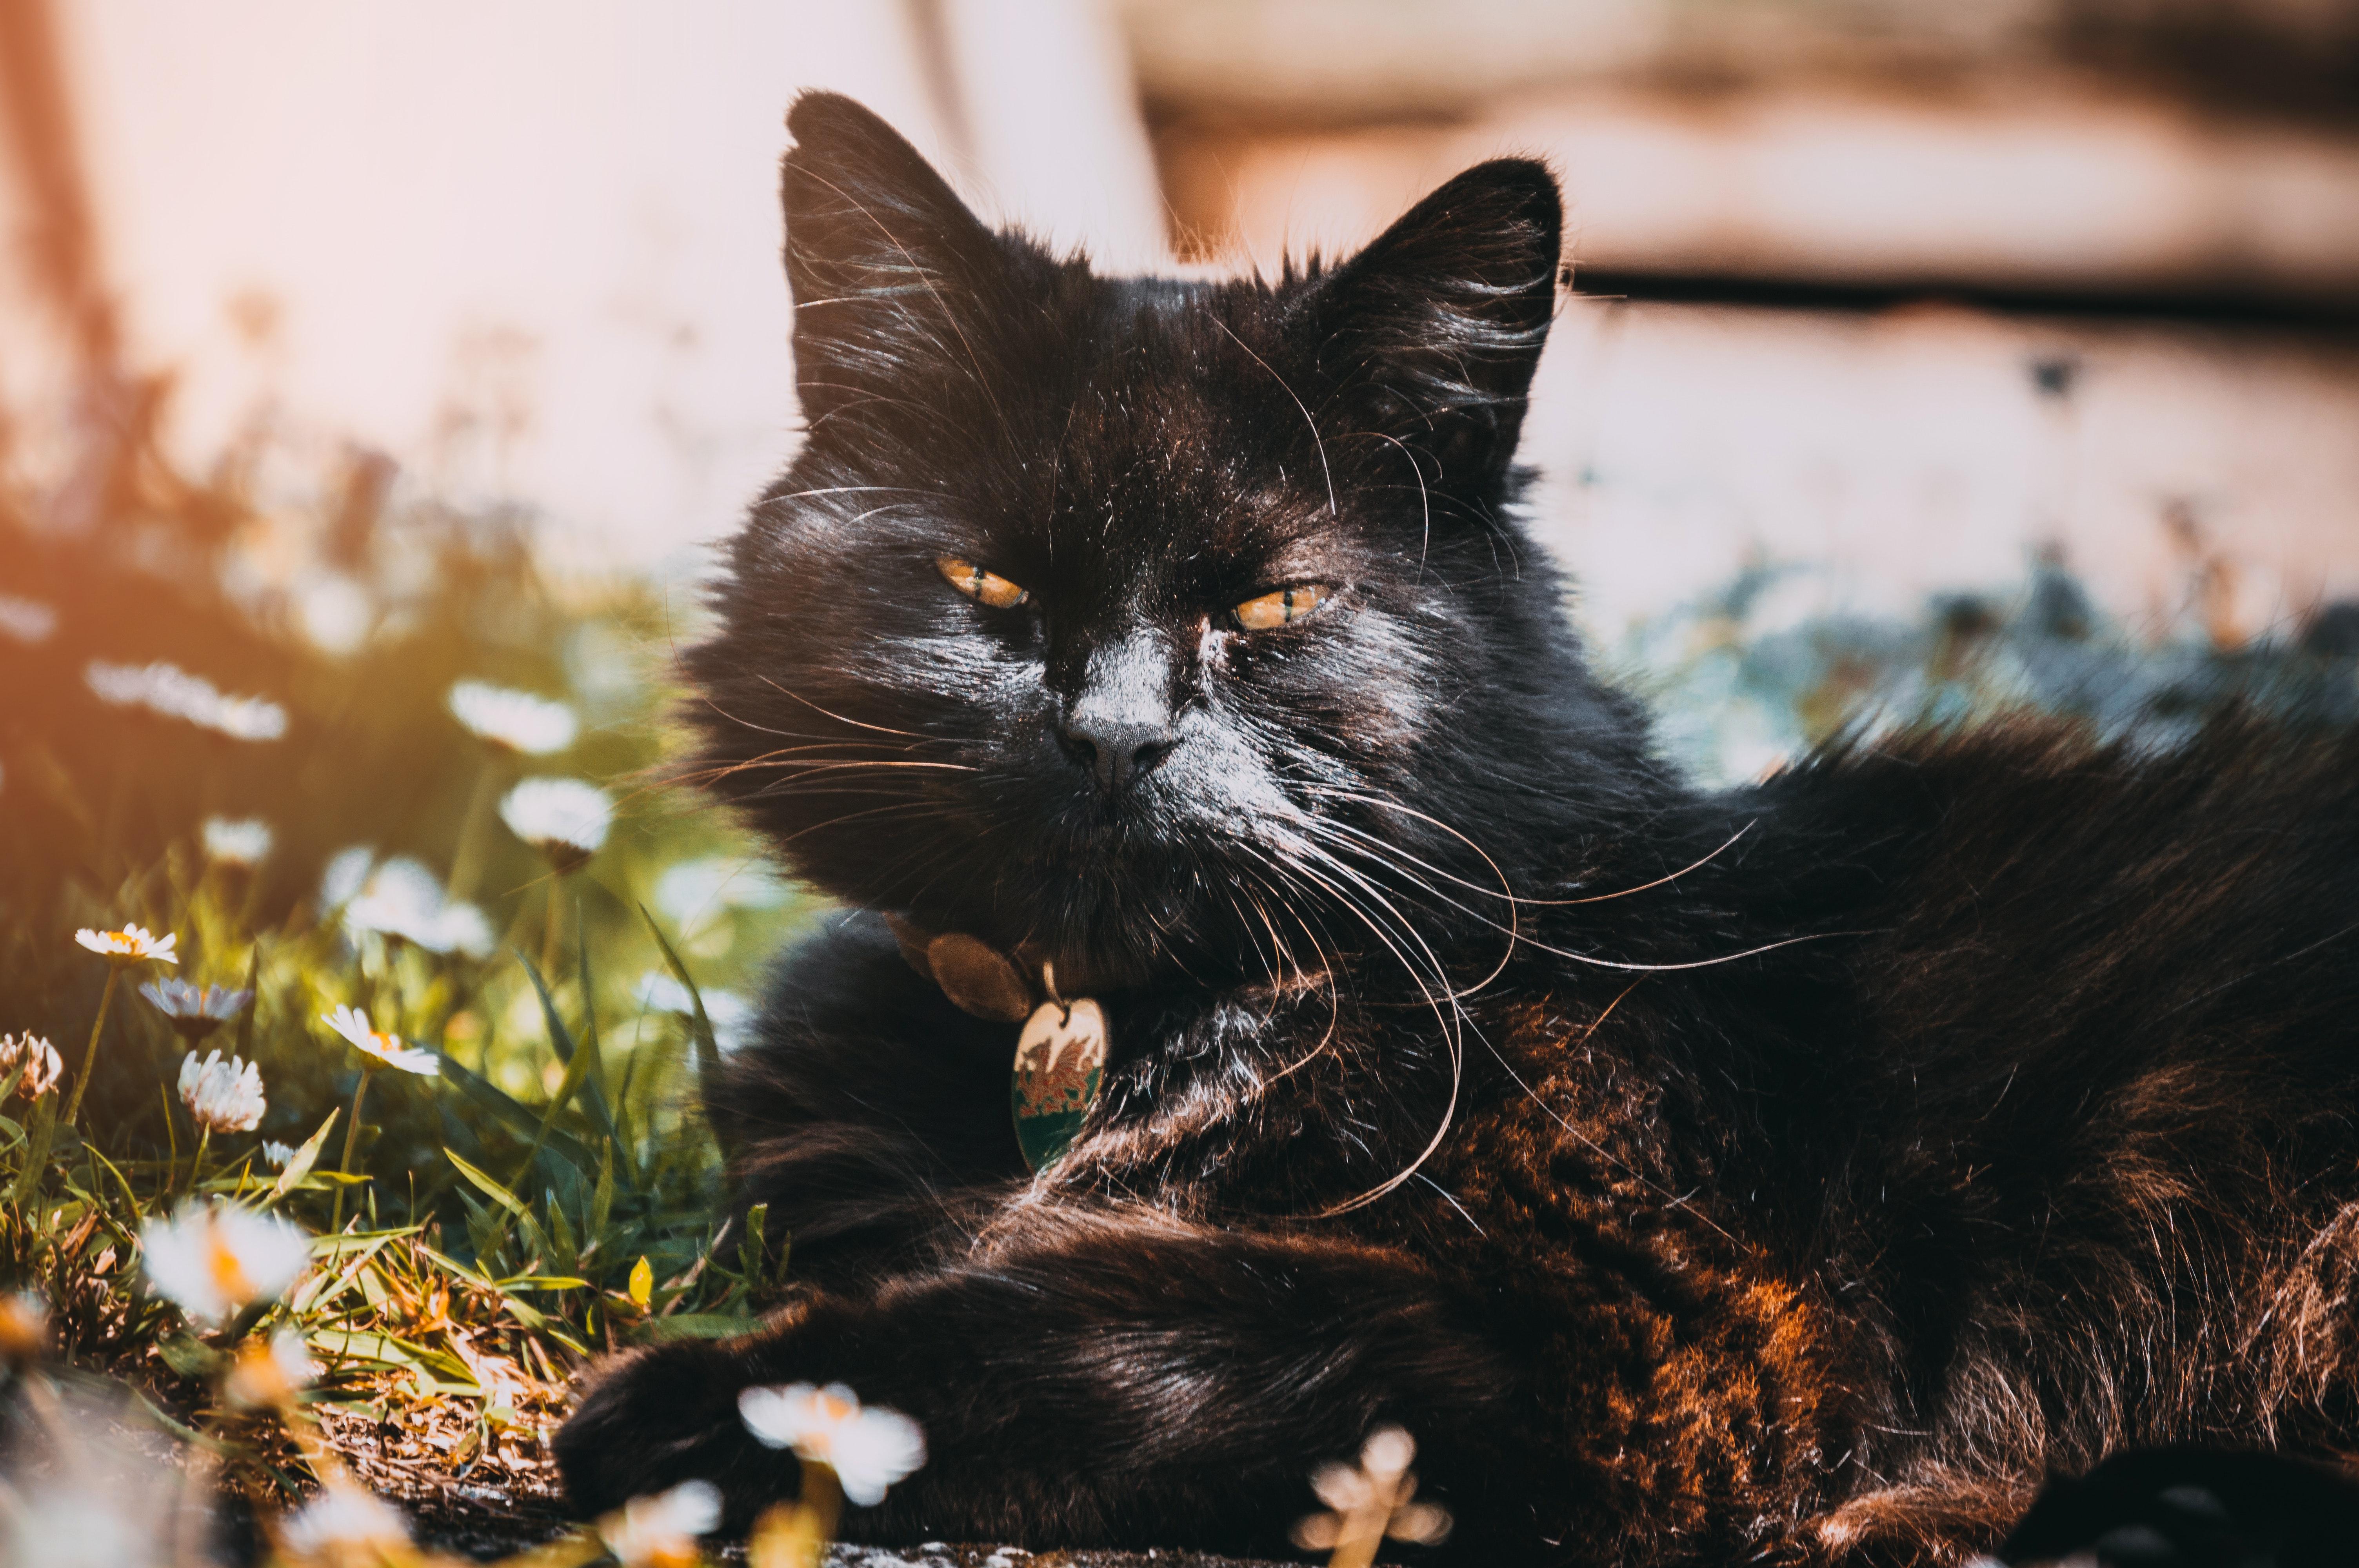 Black cat under sunny sky photo